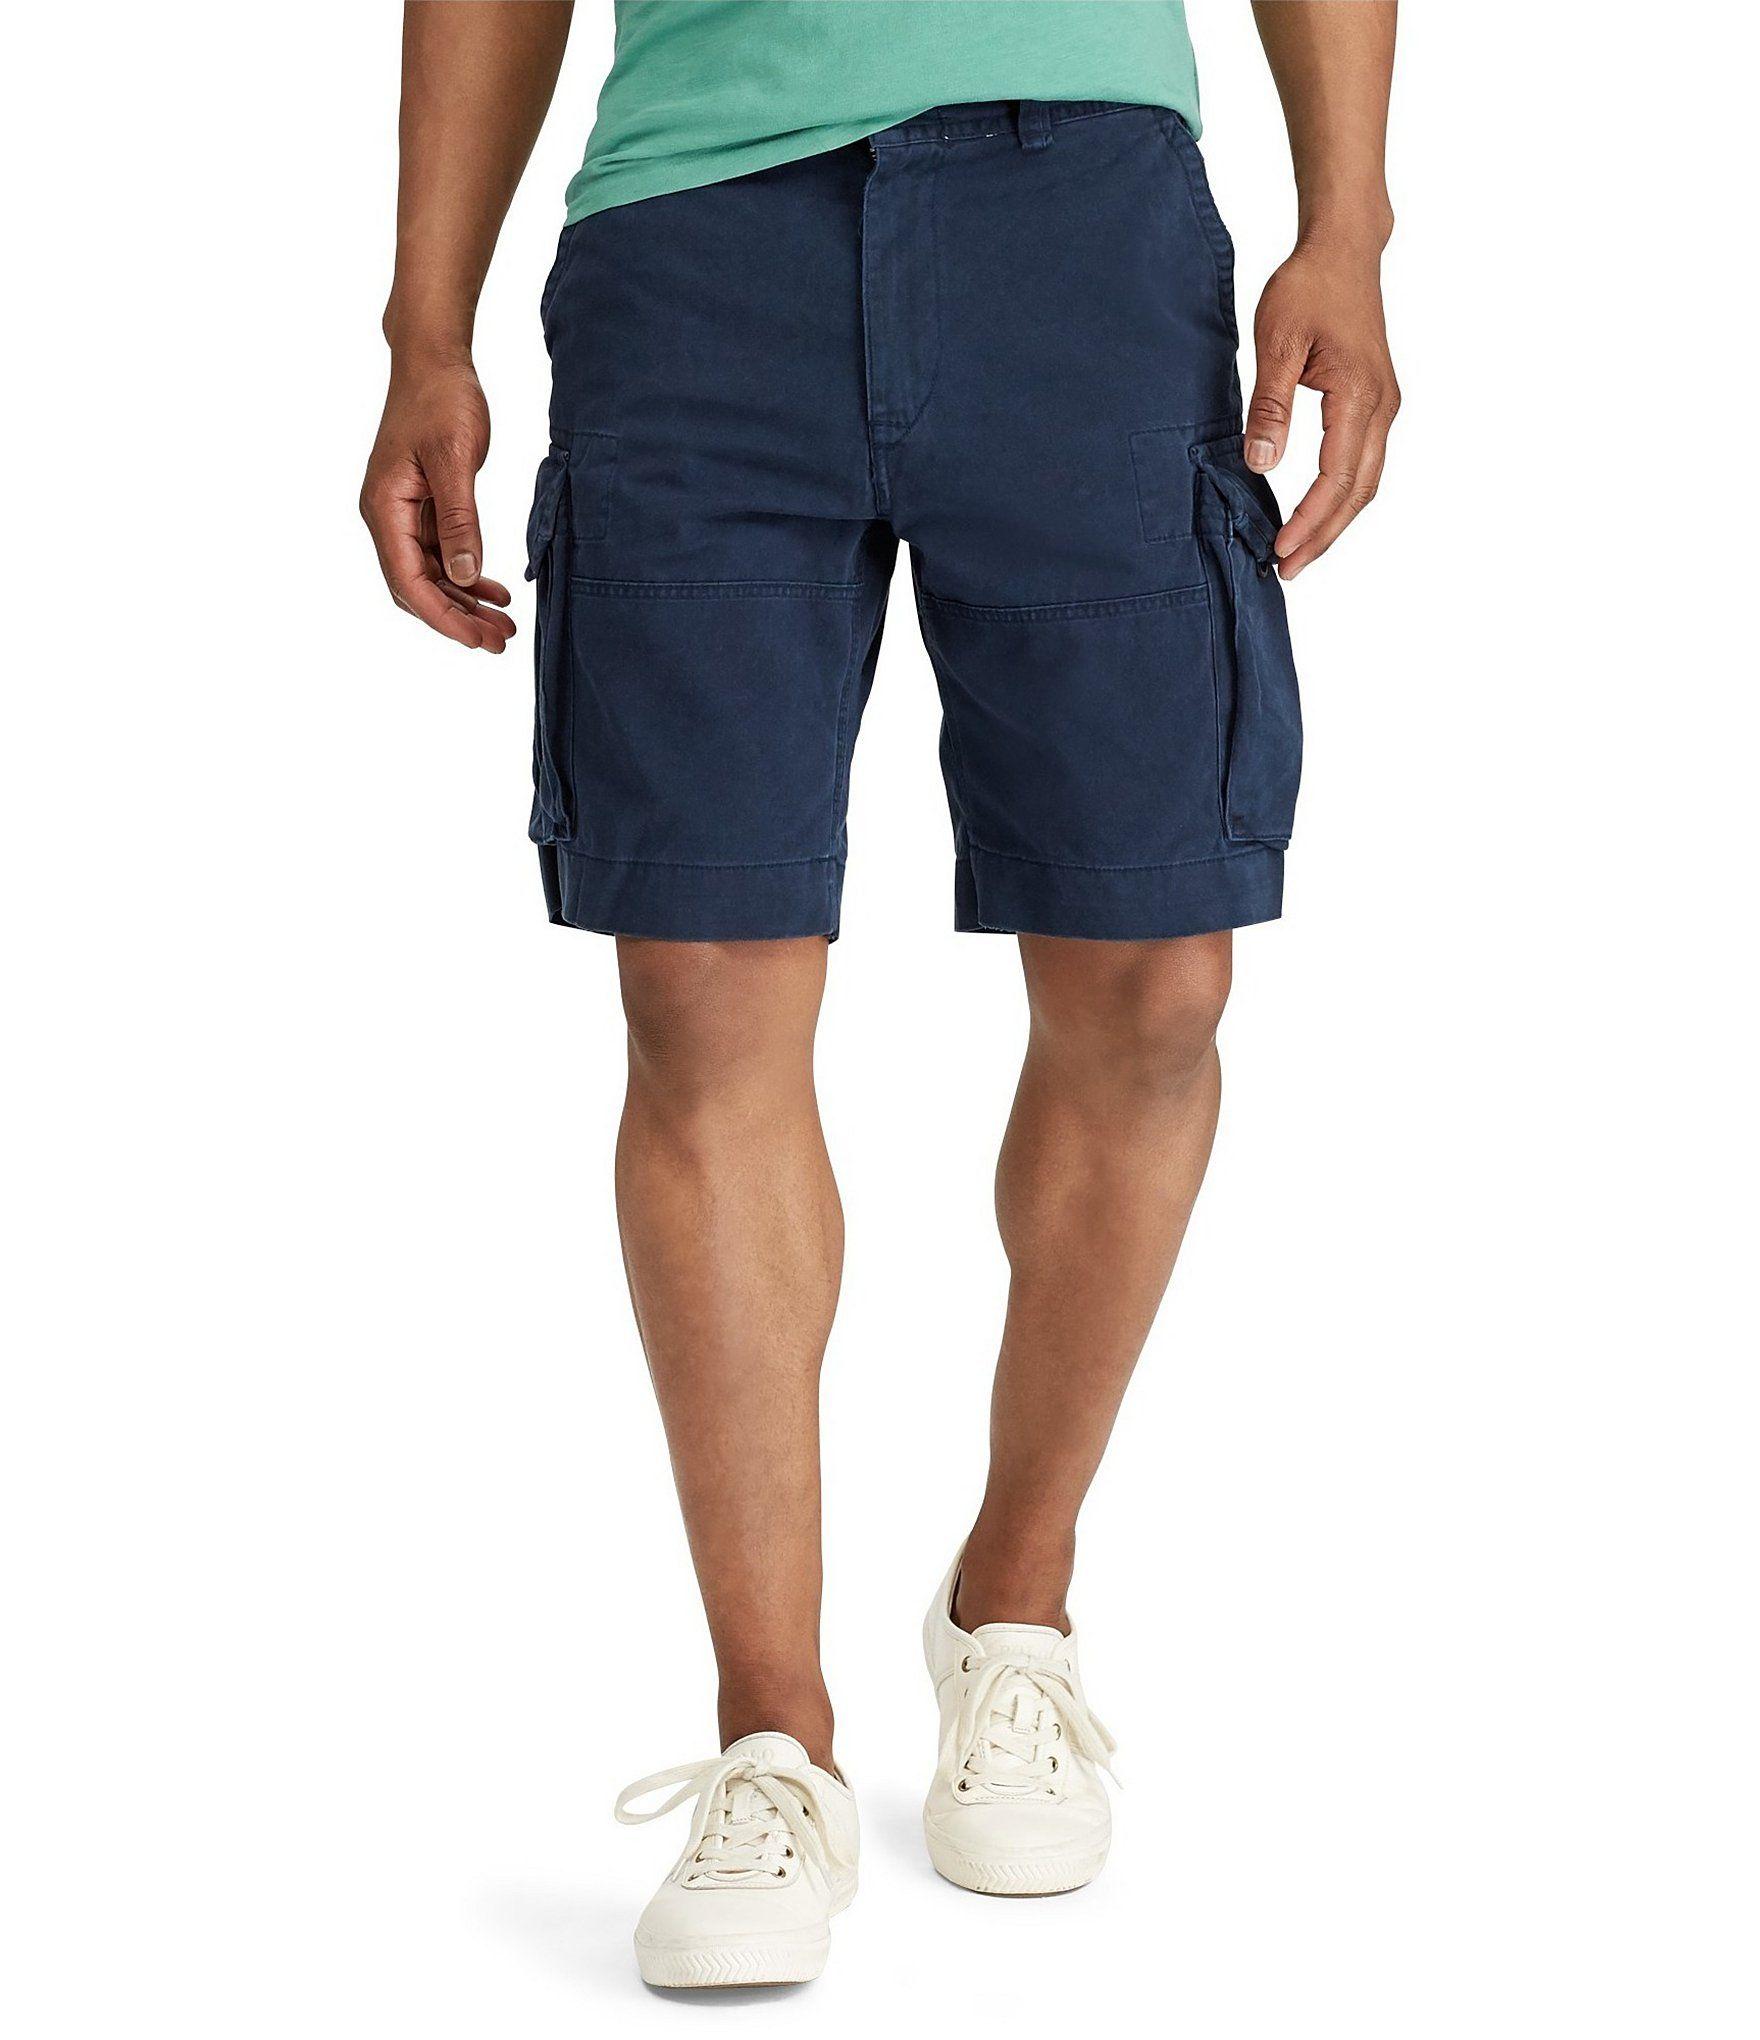 100% autentisk rabatt butik Sells Polo Ralph Lauren Gellar 10 14 Inseam Cargo Shorts - 32 in 2020 ...